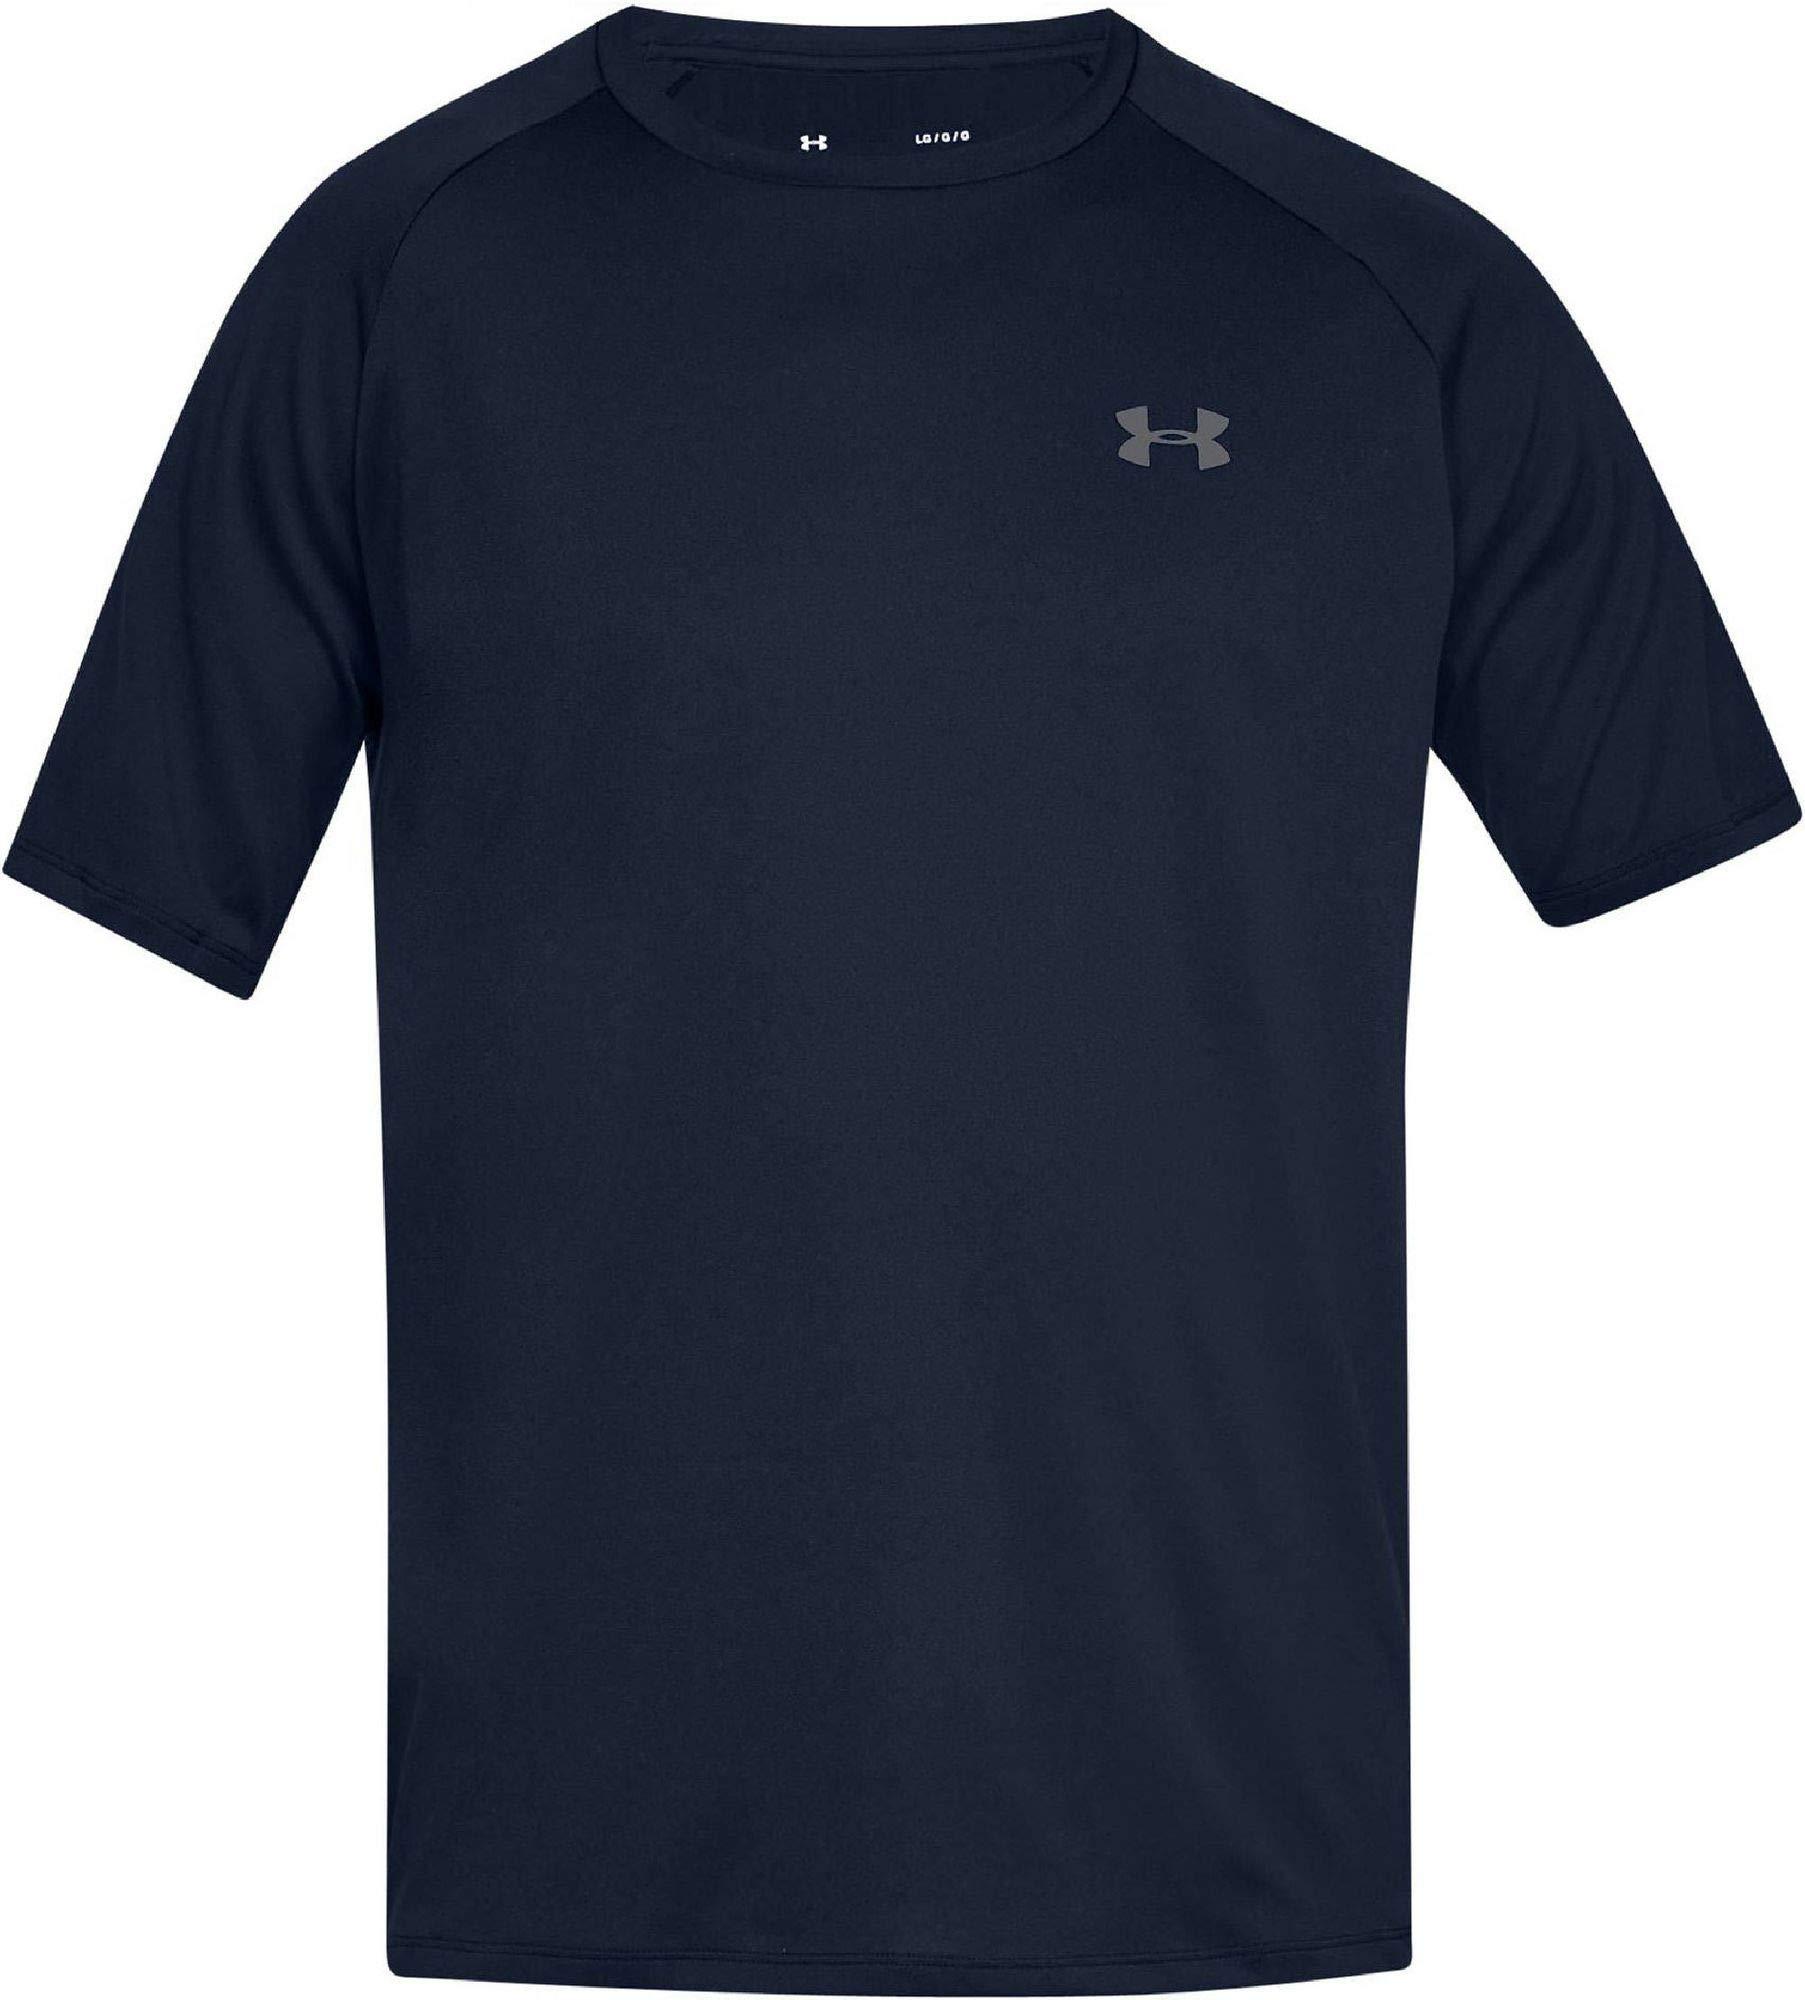 Under Armour Men's UA Tech Short Sleeve Tee 2.0, Academy/Graphite, XS-R